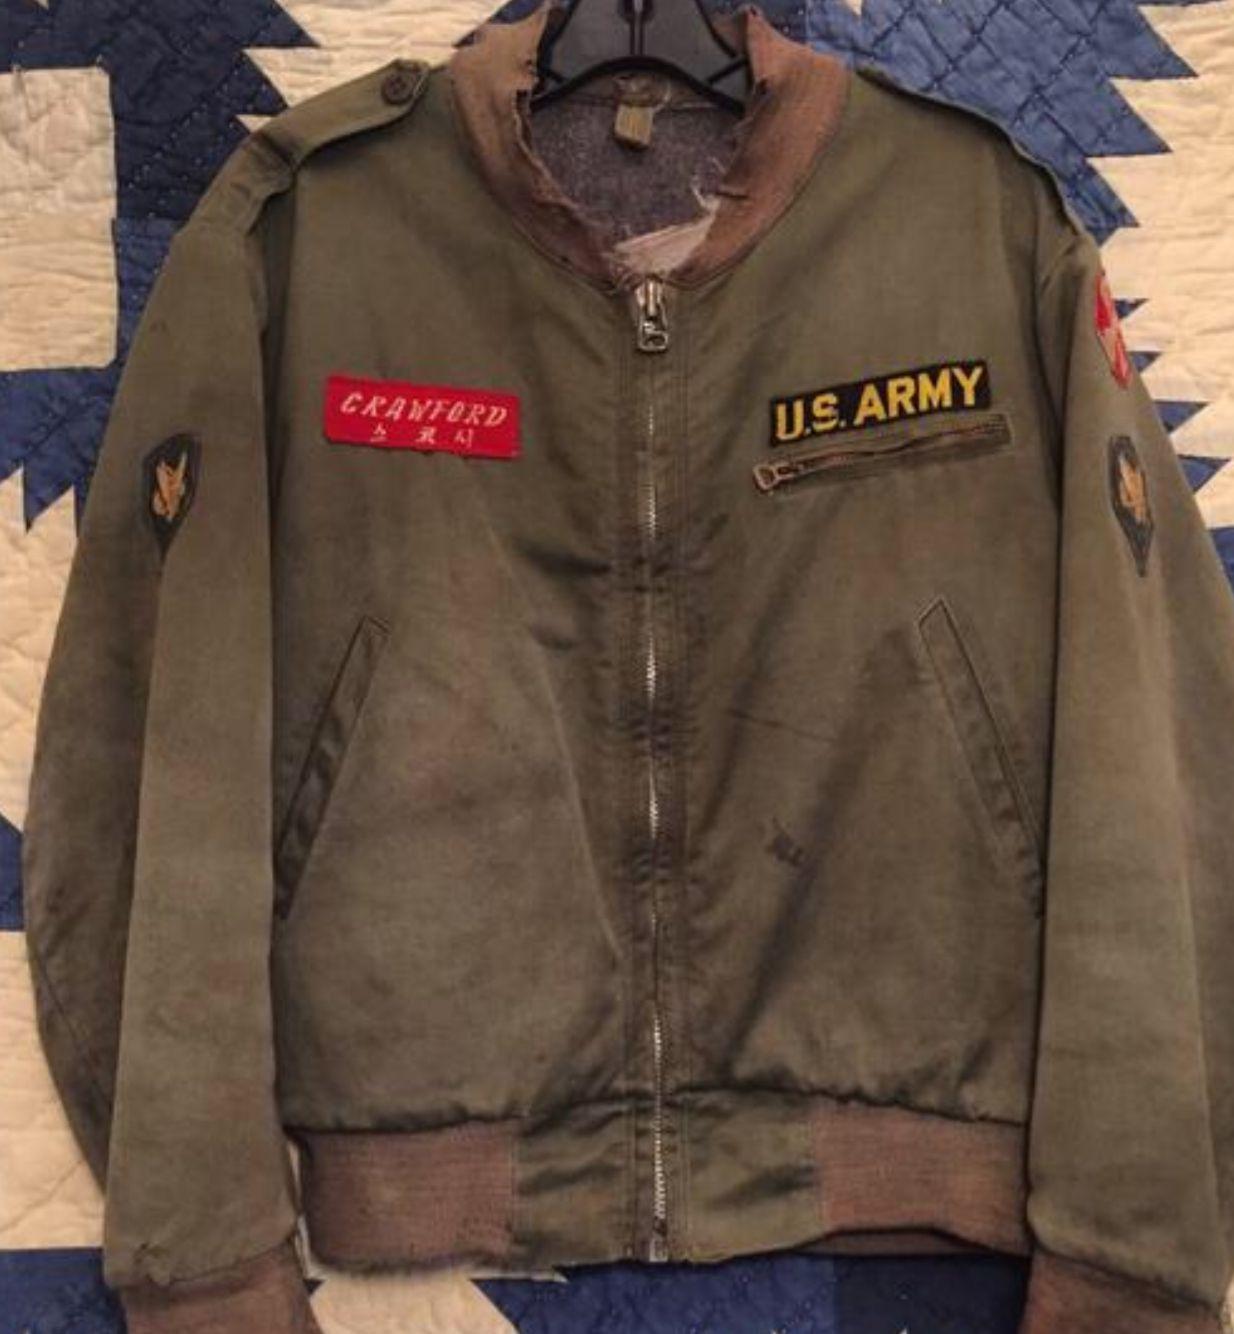 Pin By Kool Krap On Vintage Military Jackets Vintage Military Jacket Jackets Military Fashion [ 1334 x 1234 Pixel ]